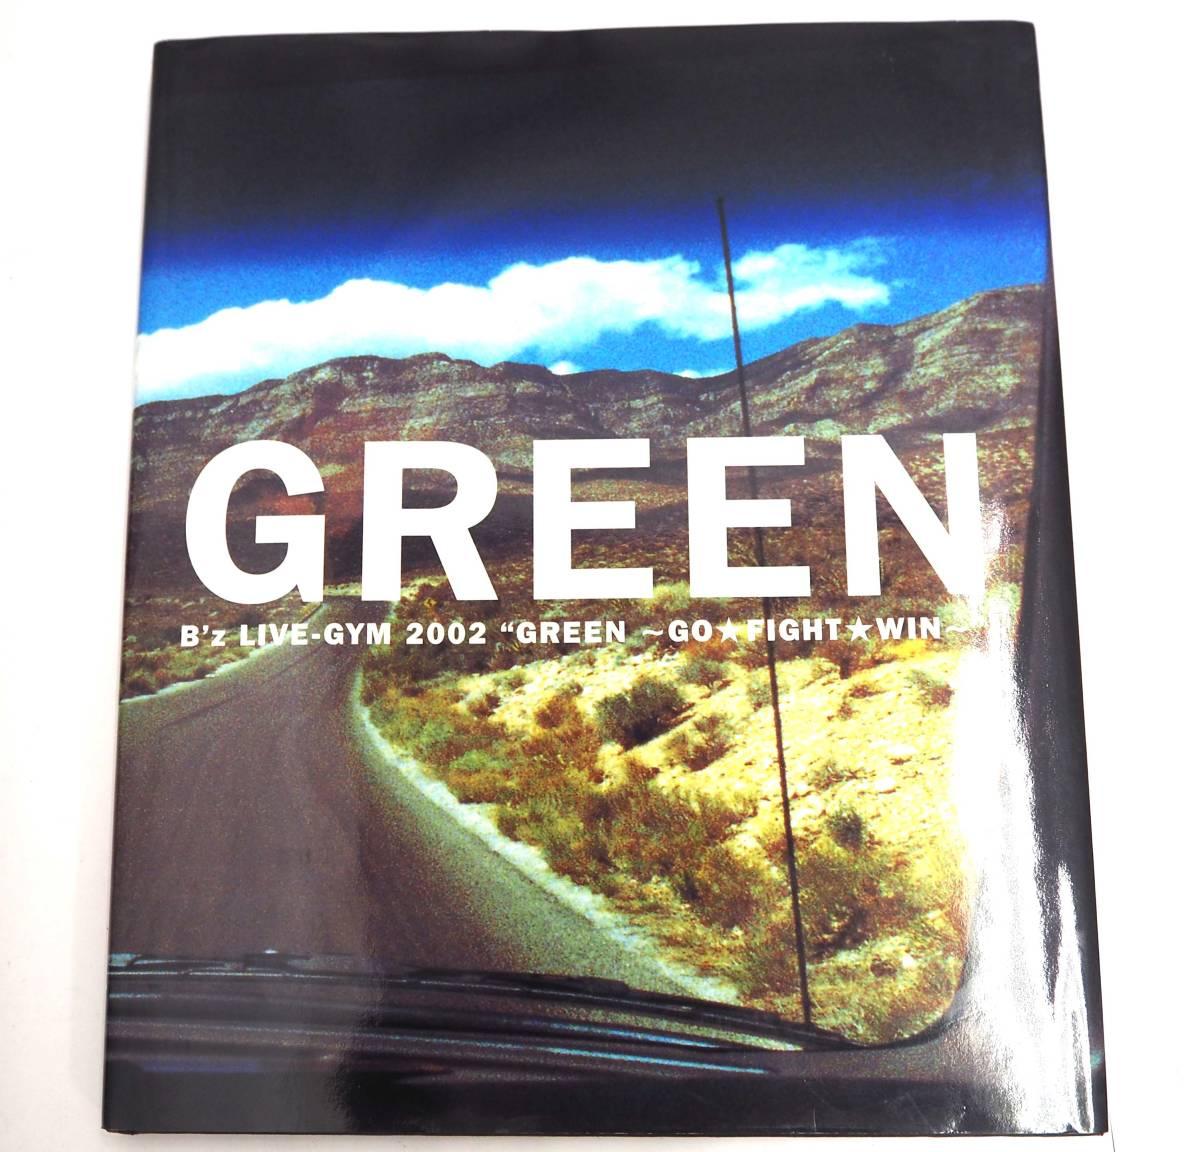 B'z LIVE GYM 2002 GREEN ツアー パンフレット_画像1